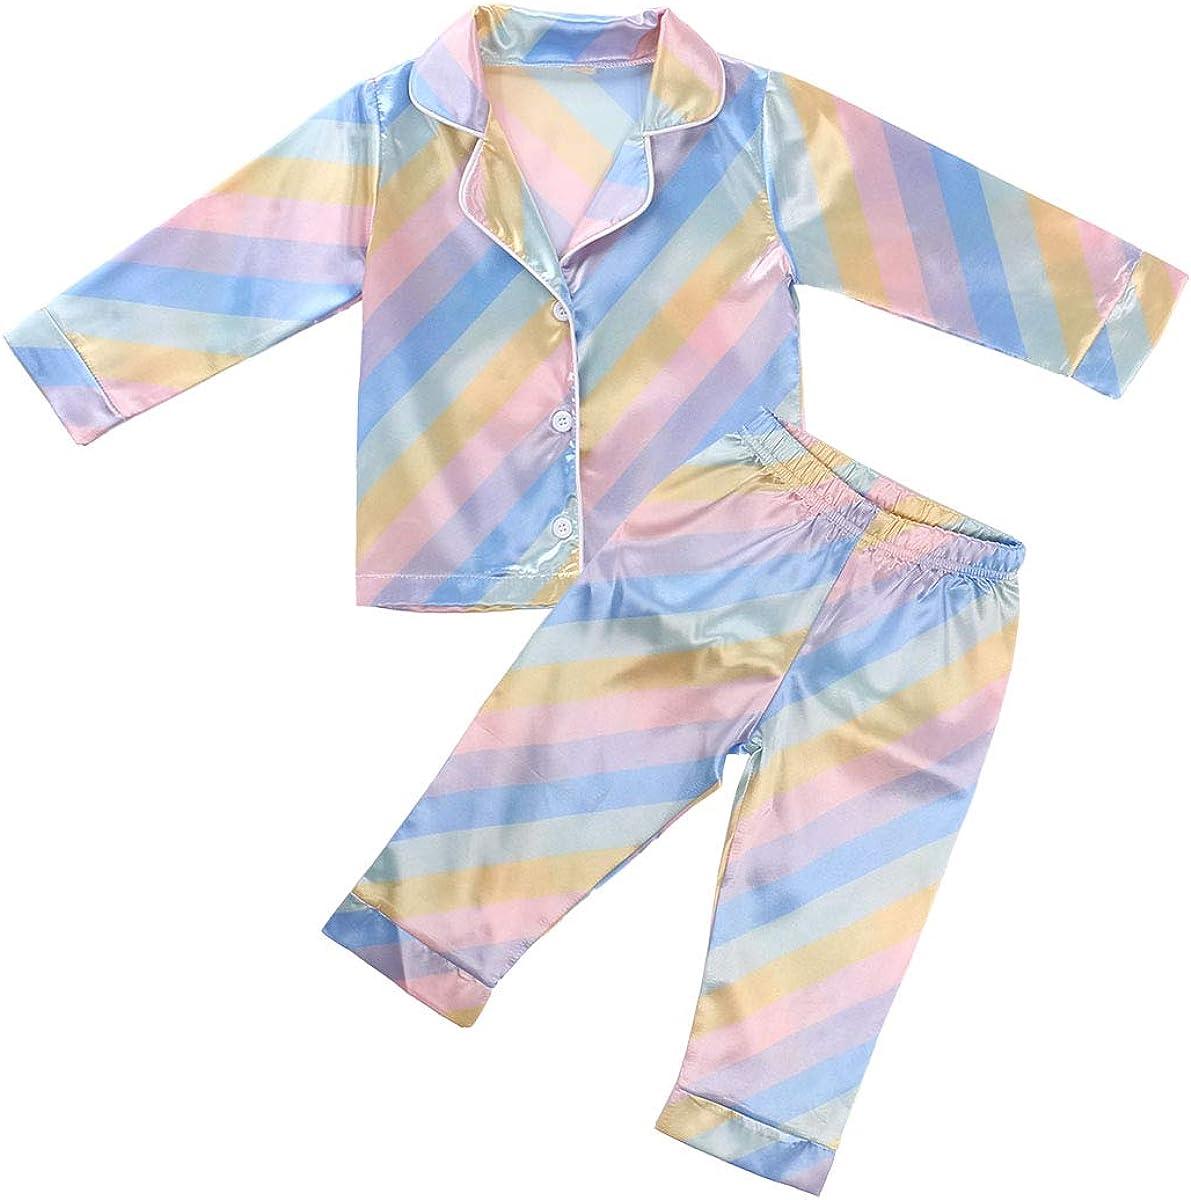 Baby Boy Girls Pajama Set Long Sleeve Satin Sleepwear Snug Fit Solid Color 2-Piece Sleeping Clothes